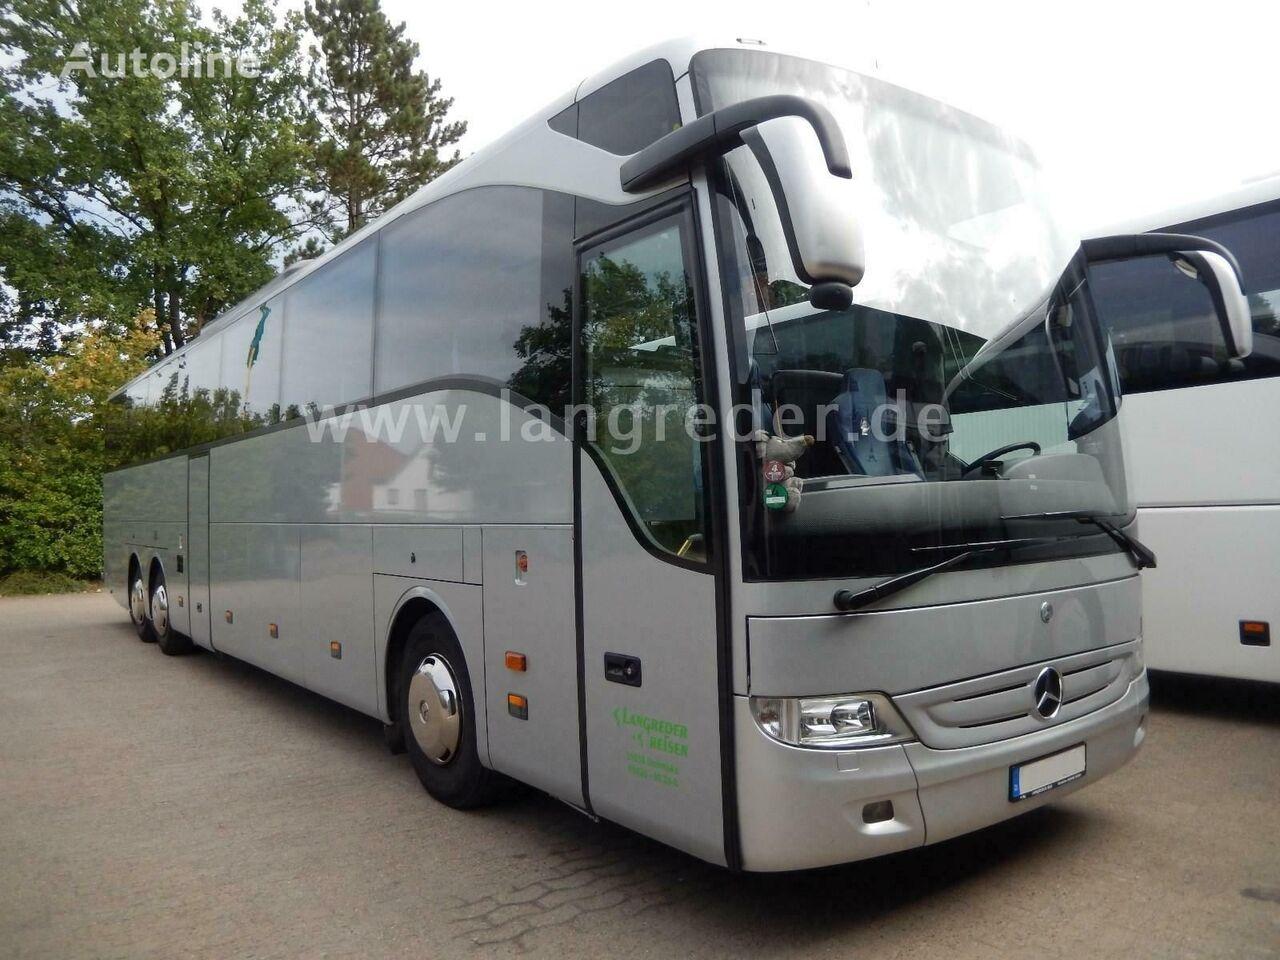 MERCEDES-BENZ Tourismo RHD-L autocares